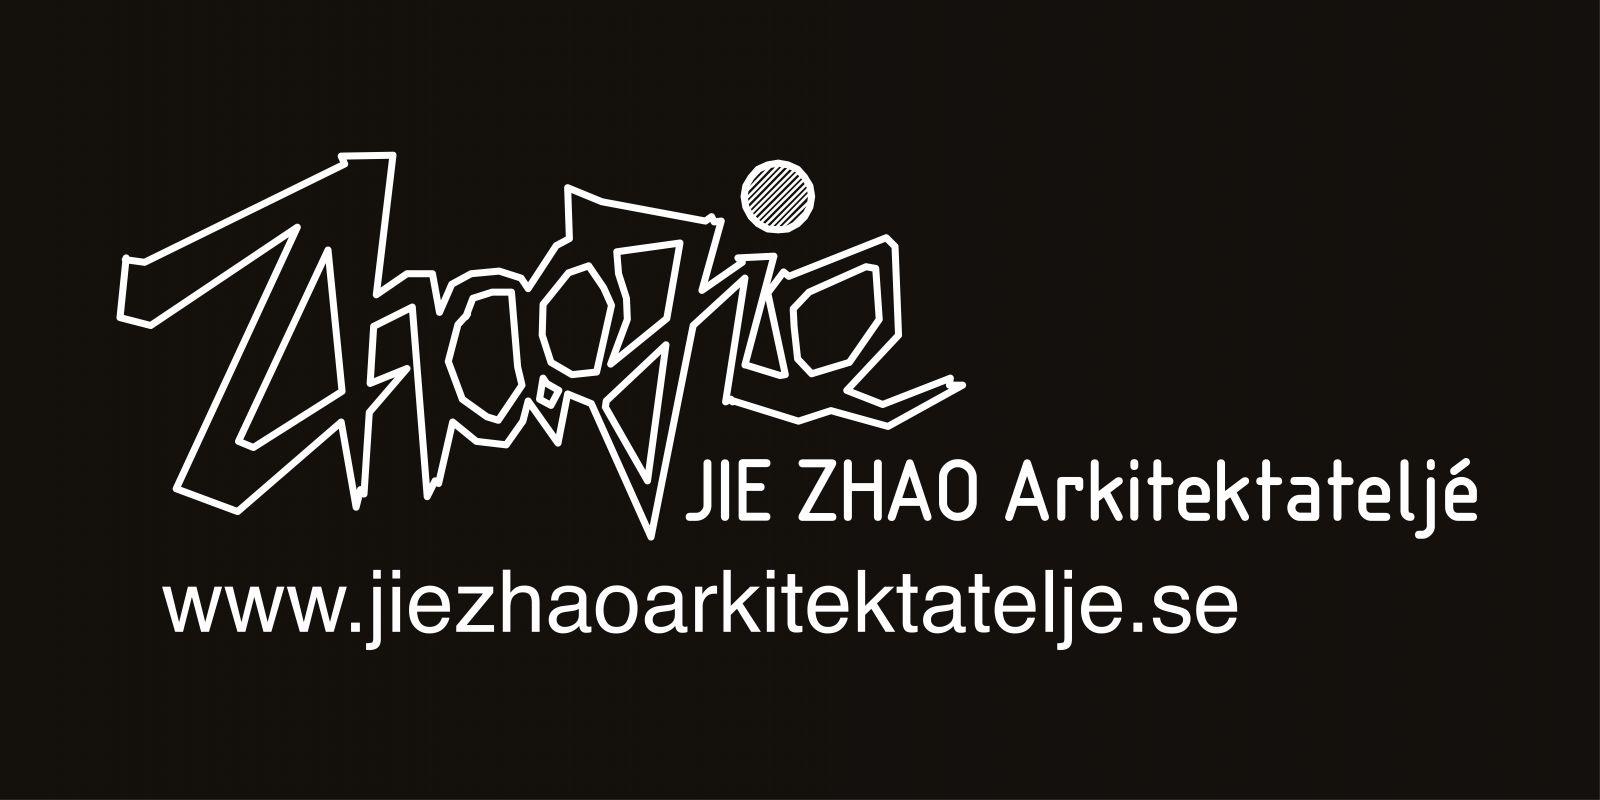 Jie Zhai Arkitektatelje